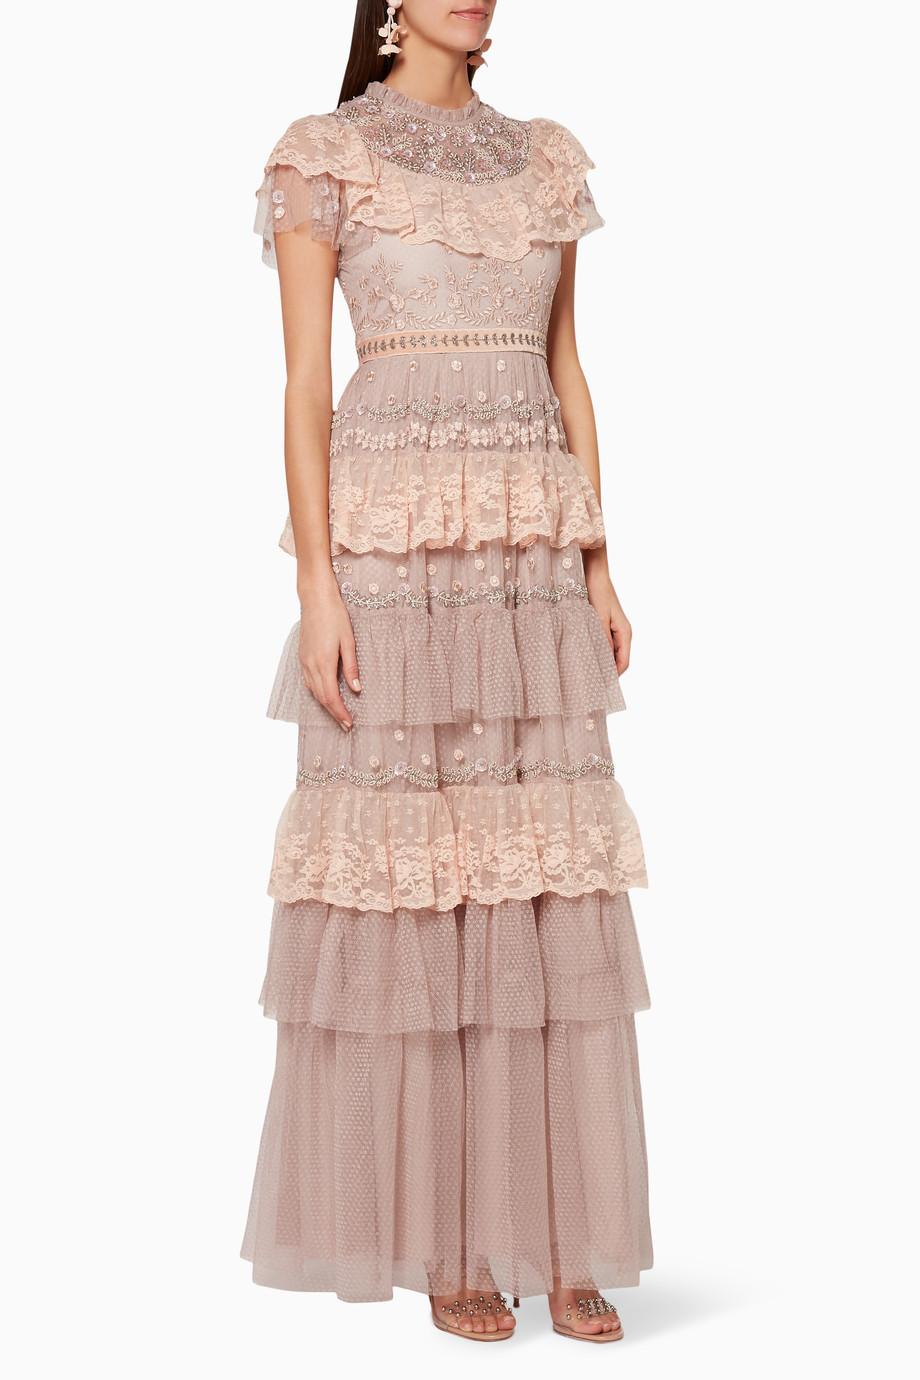 Dusk For Needleamp; Rose Cinderella Shop Pink Embellished Thread Gown CrdxQoBeW